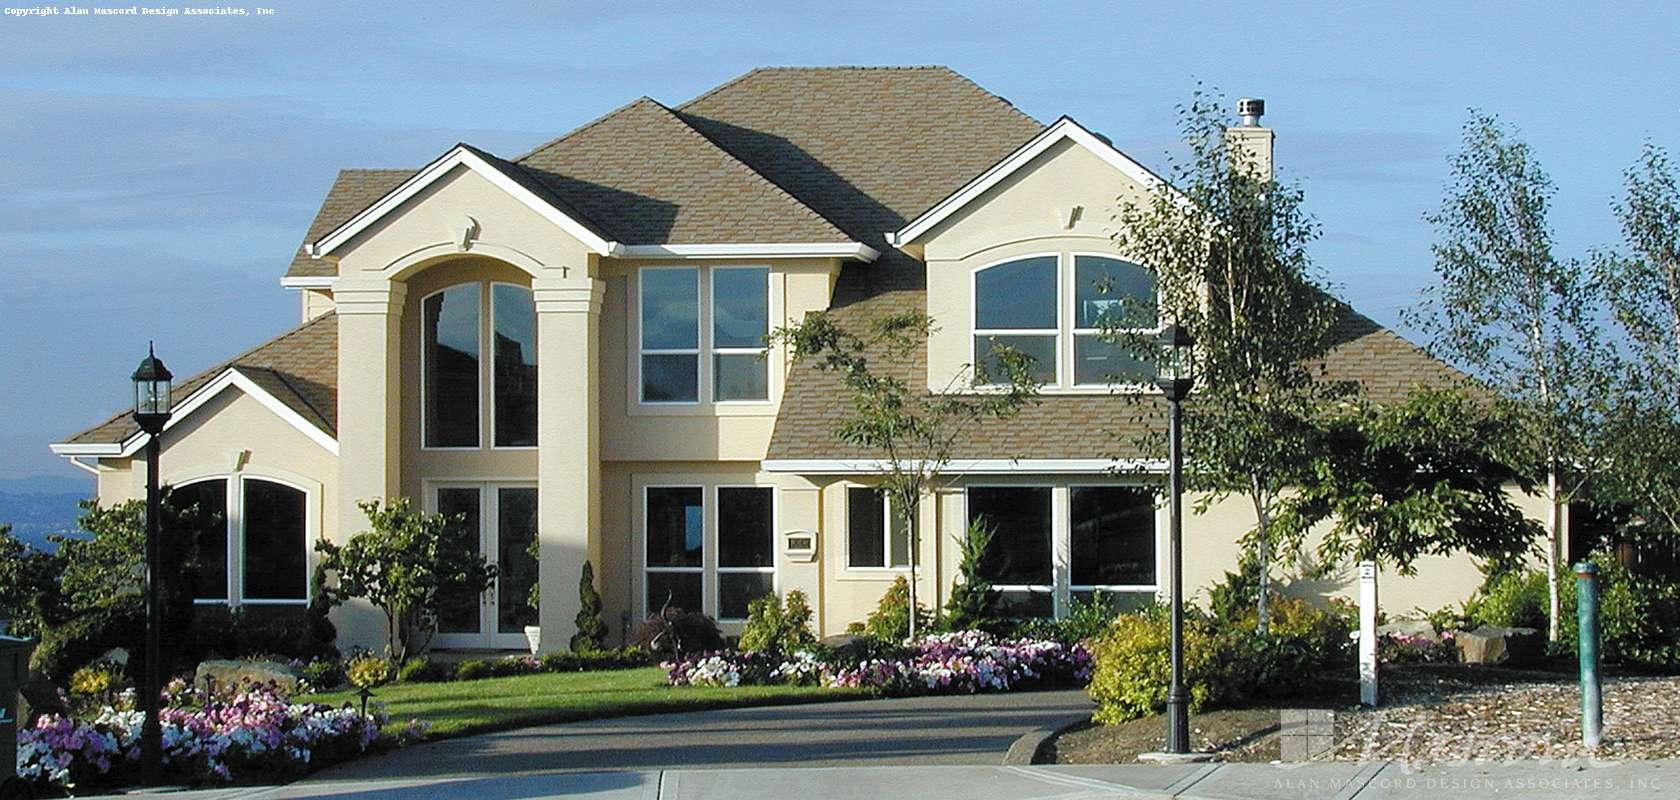 Mascord House Plan B2237P: The Bayport